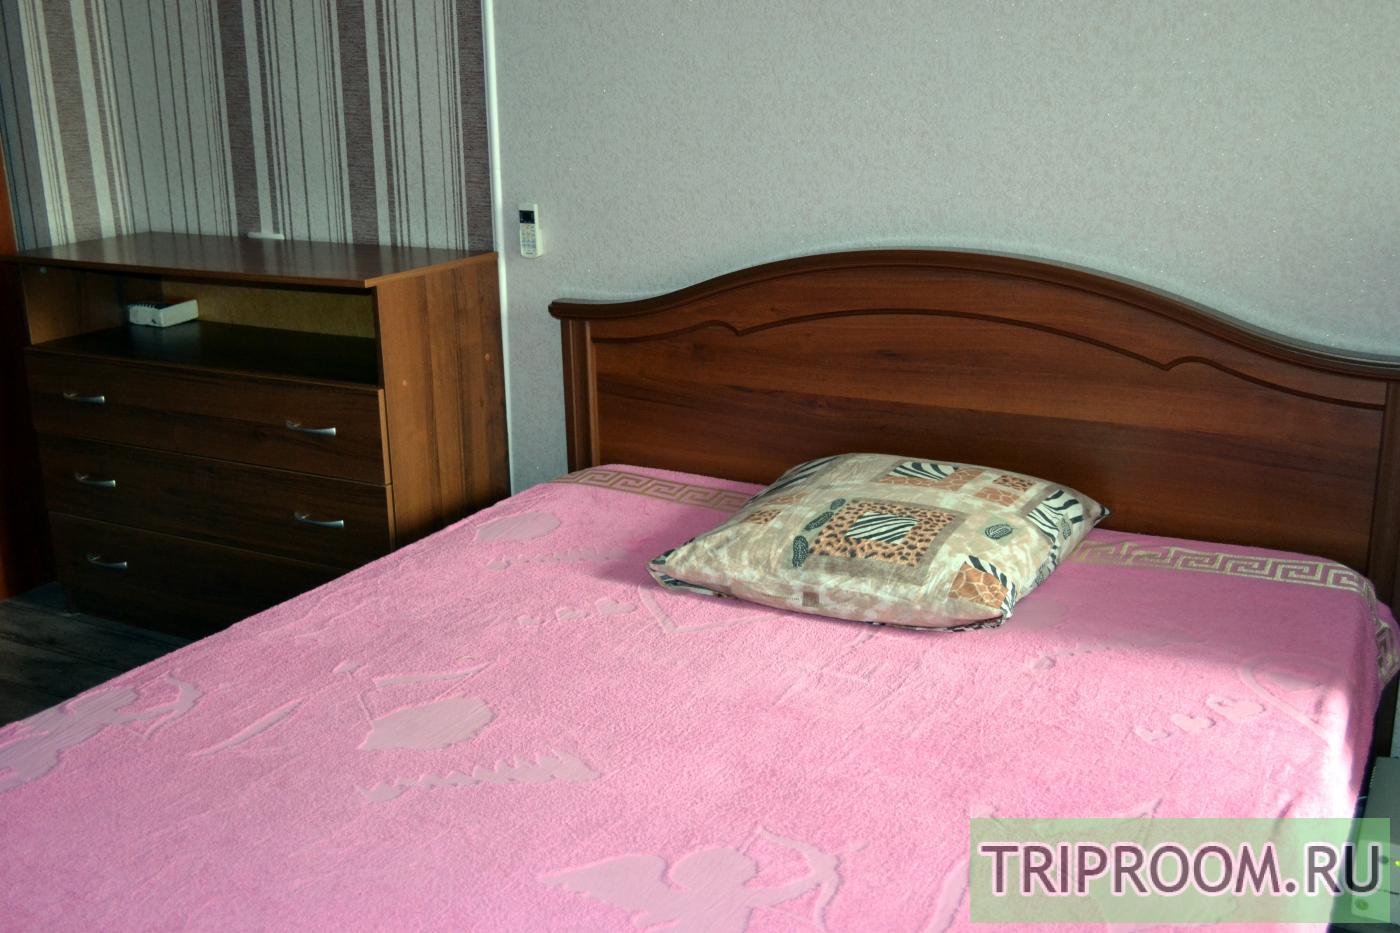 1-комнатная квартира посуточно (вариант № 7481), ул. 40 Лет ВЛКСМ улица, фото № 2